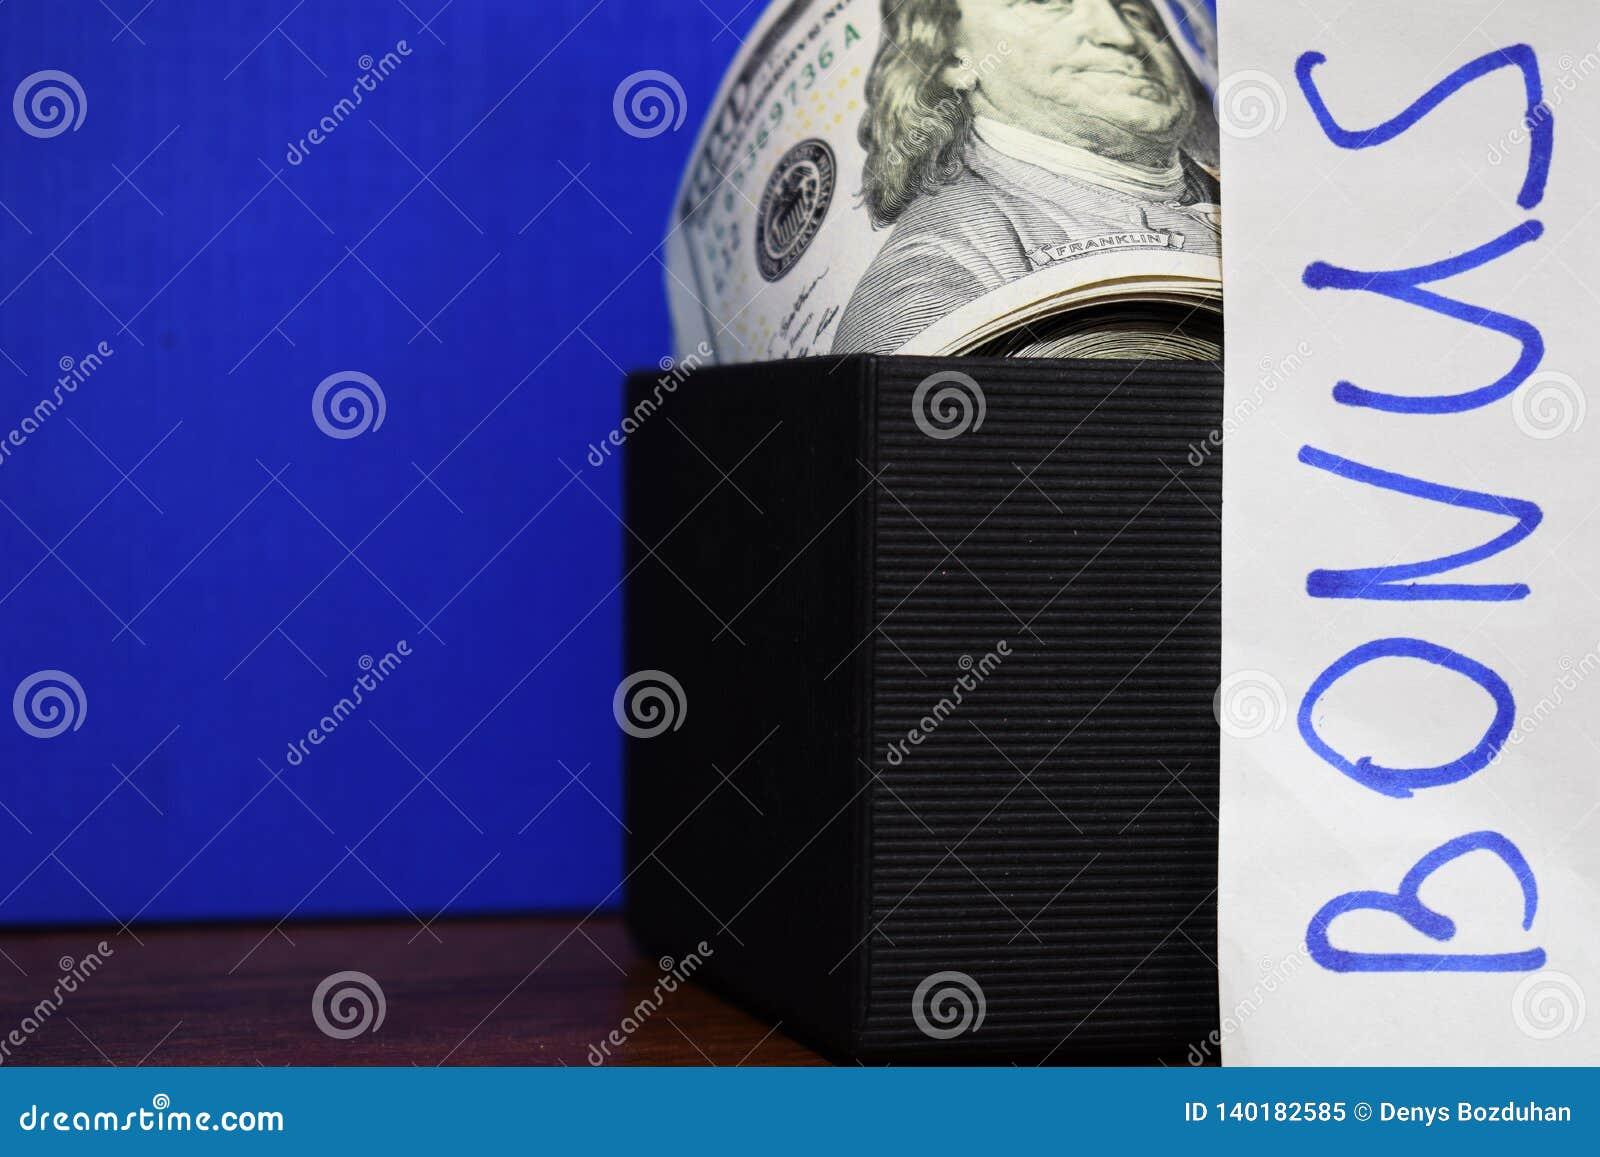 Bundle of dollars in gift box isolated on blue background, the inscription Bonus